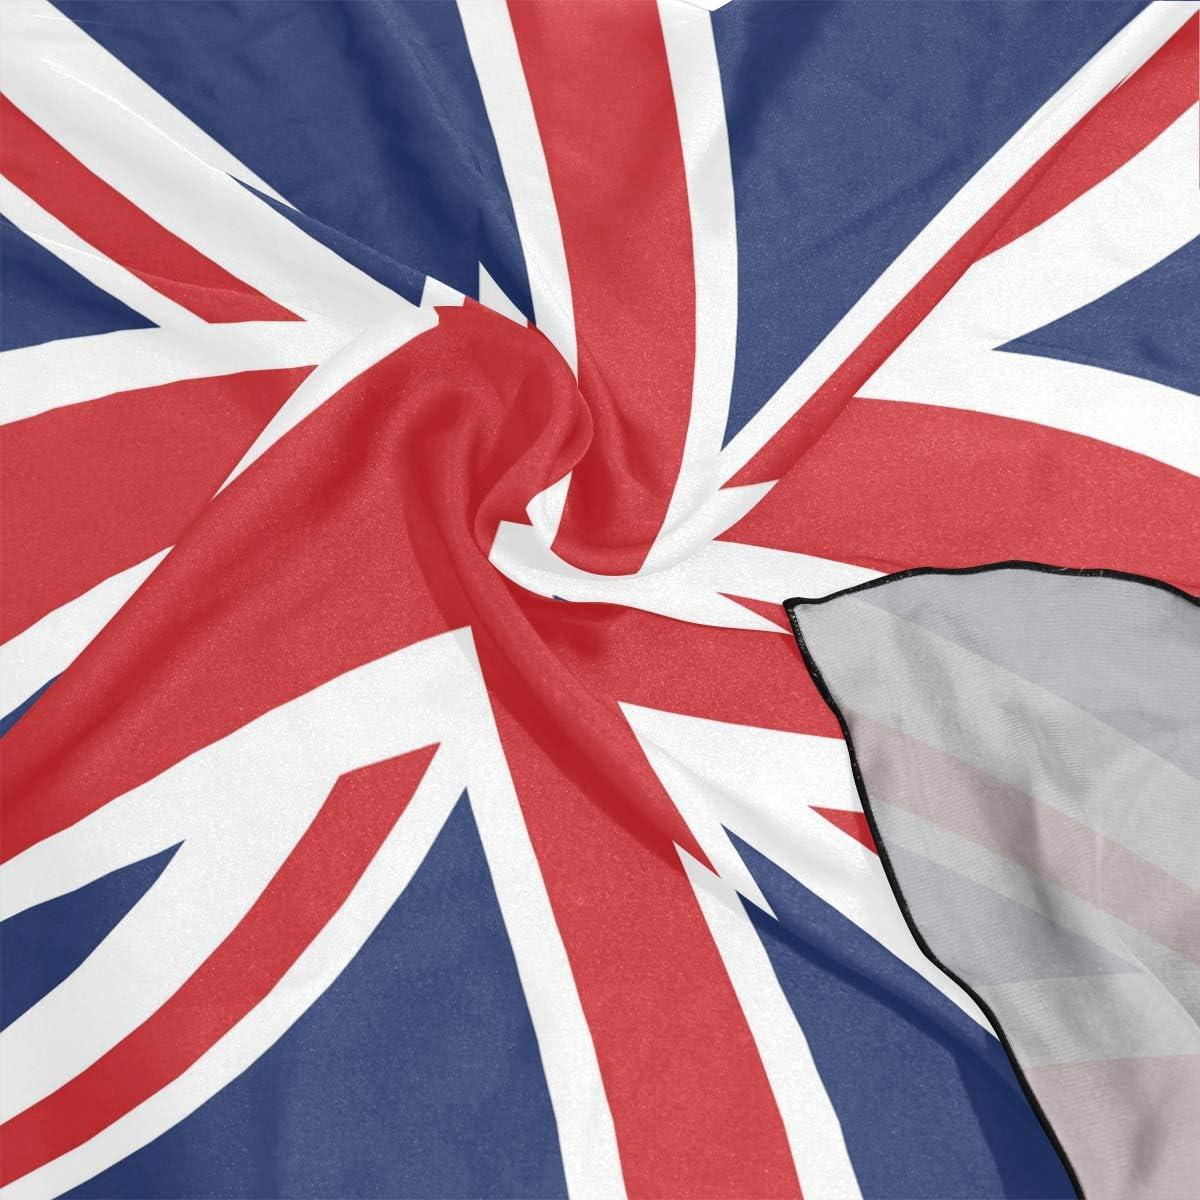 XLING Fashion Square Scarf British Union Jack Flag Stripe Lightweight Sunscreen Scarves Muffler Hair Wrap Headscarf Neckerchief for Women Men